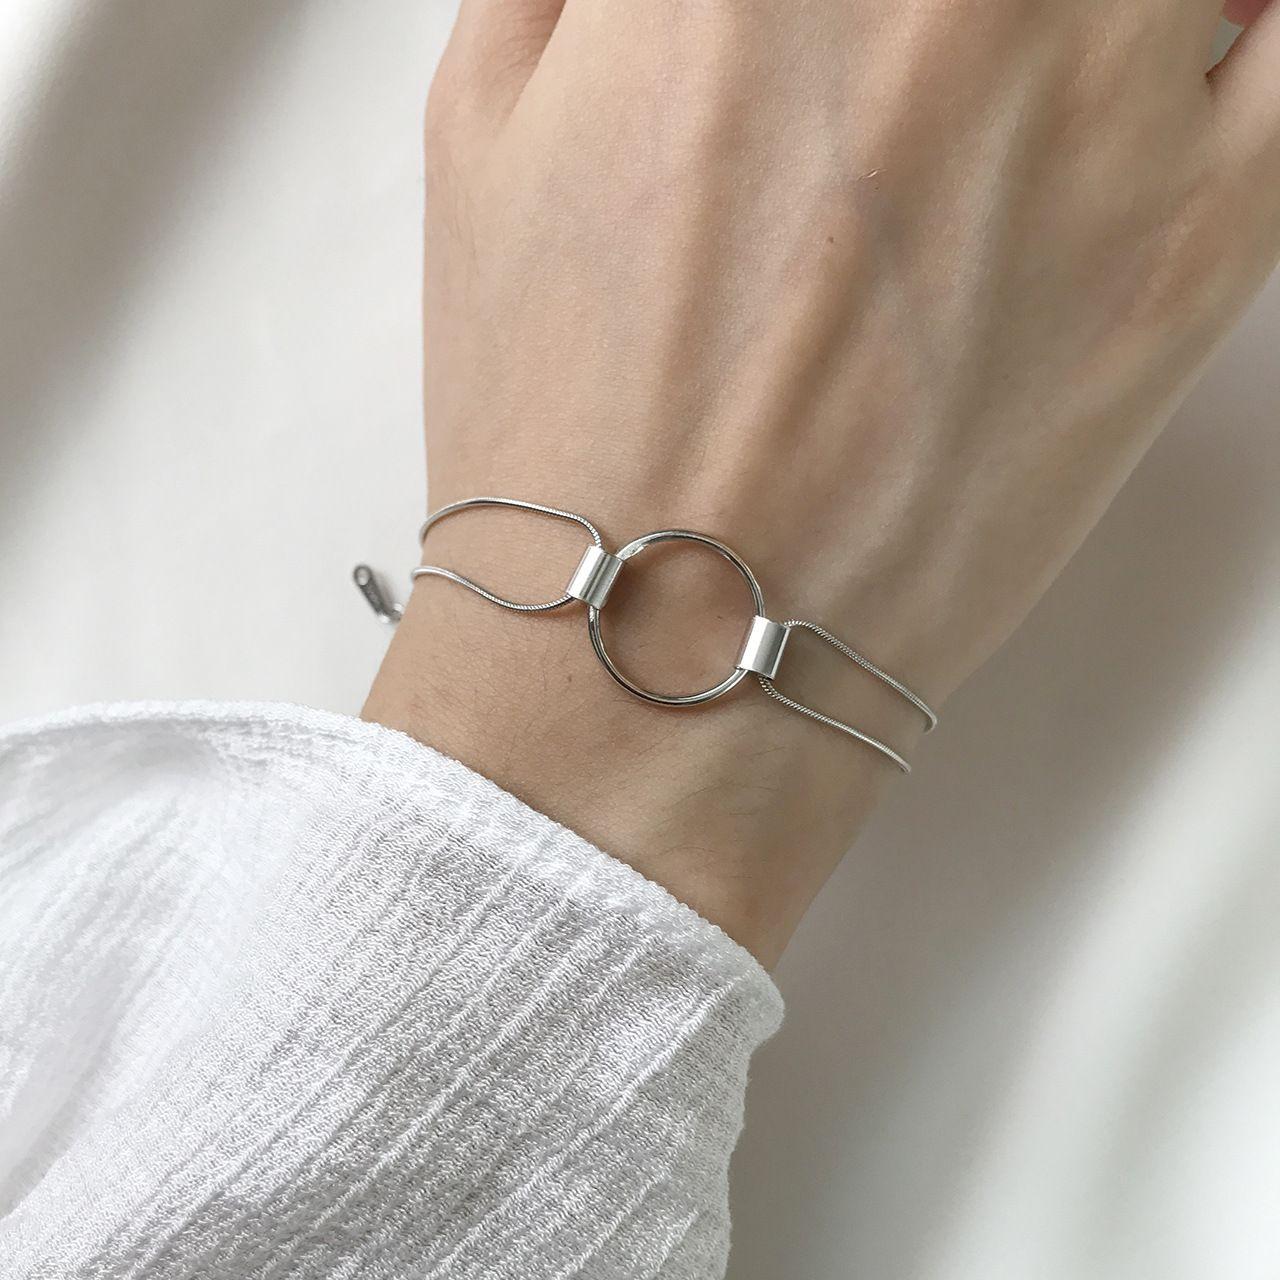 gato Chaofu coreana S925 plata cadena geométrico gruesa cadena círculo serpiente hueso pulsera